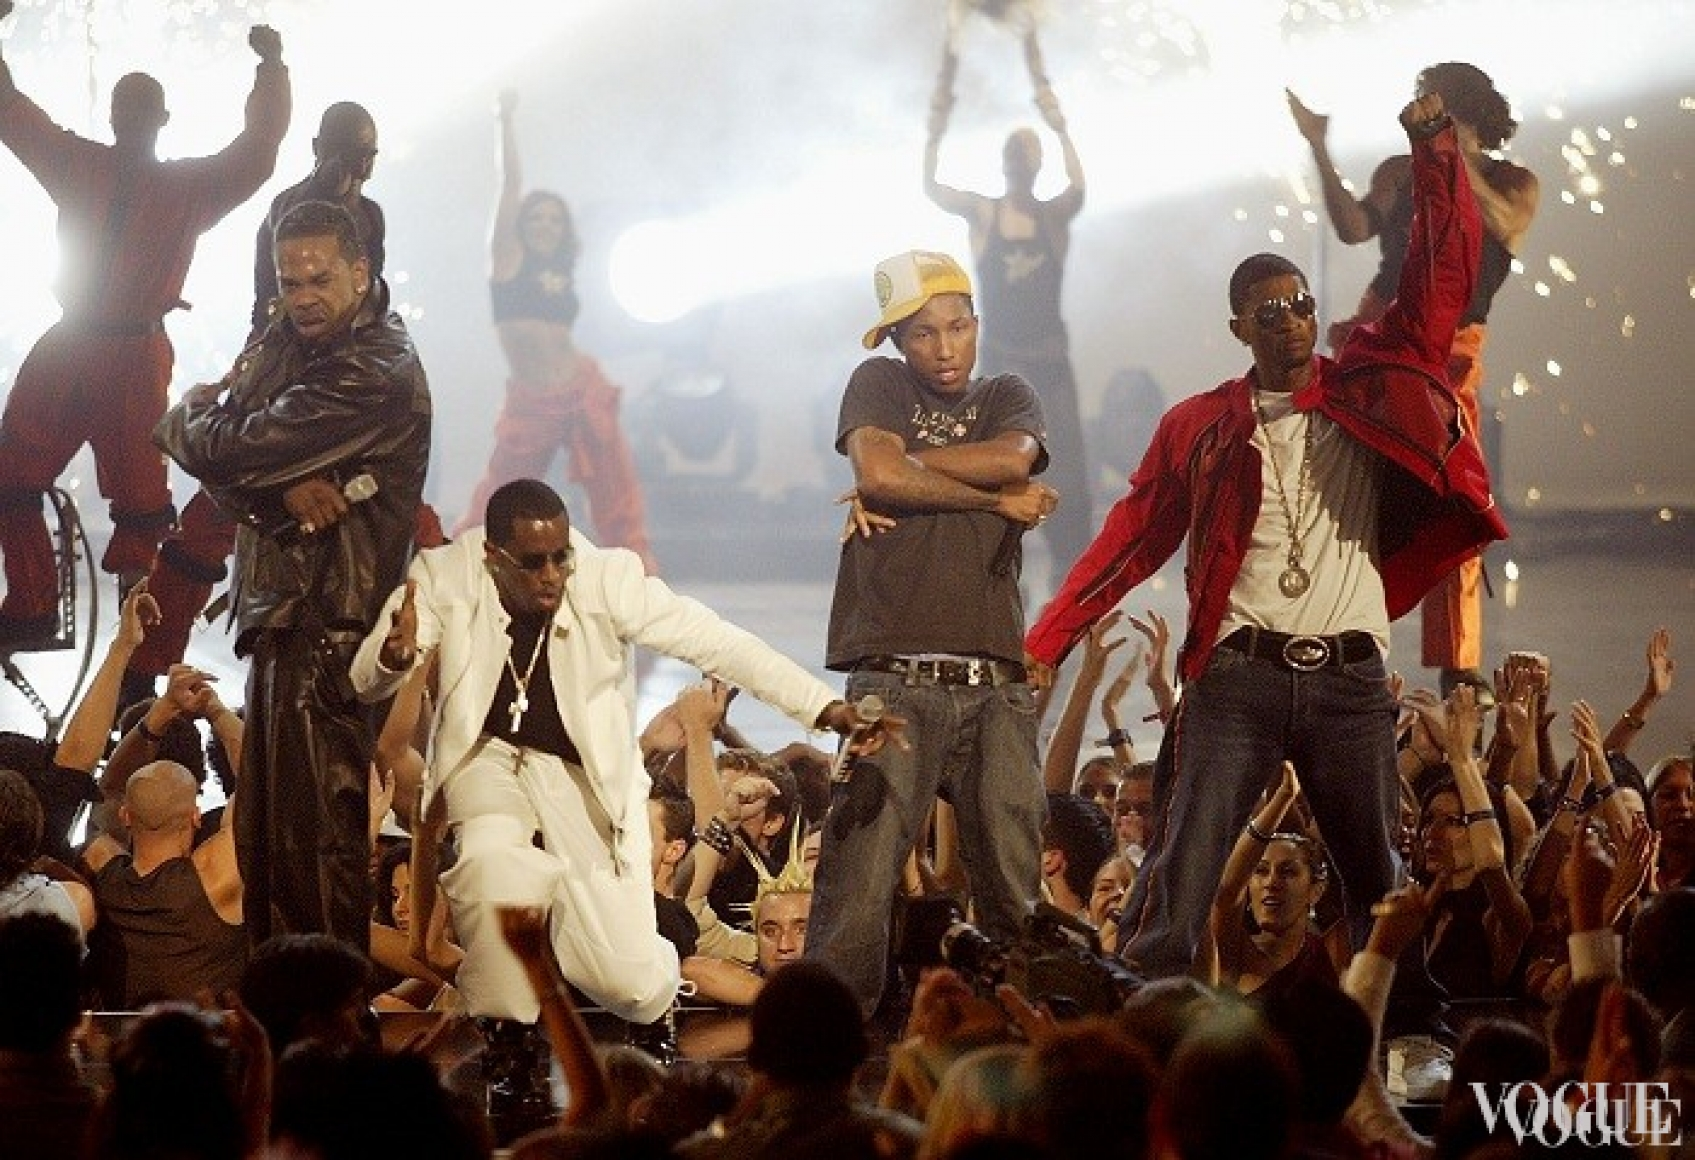 Баста Райамс, P. Diddy, Фаррелл Уильмс (из дуэта Neptunes) и Usher, 2002